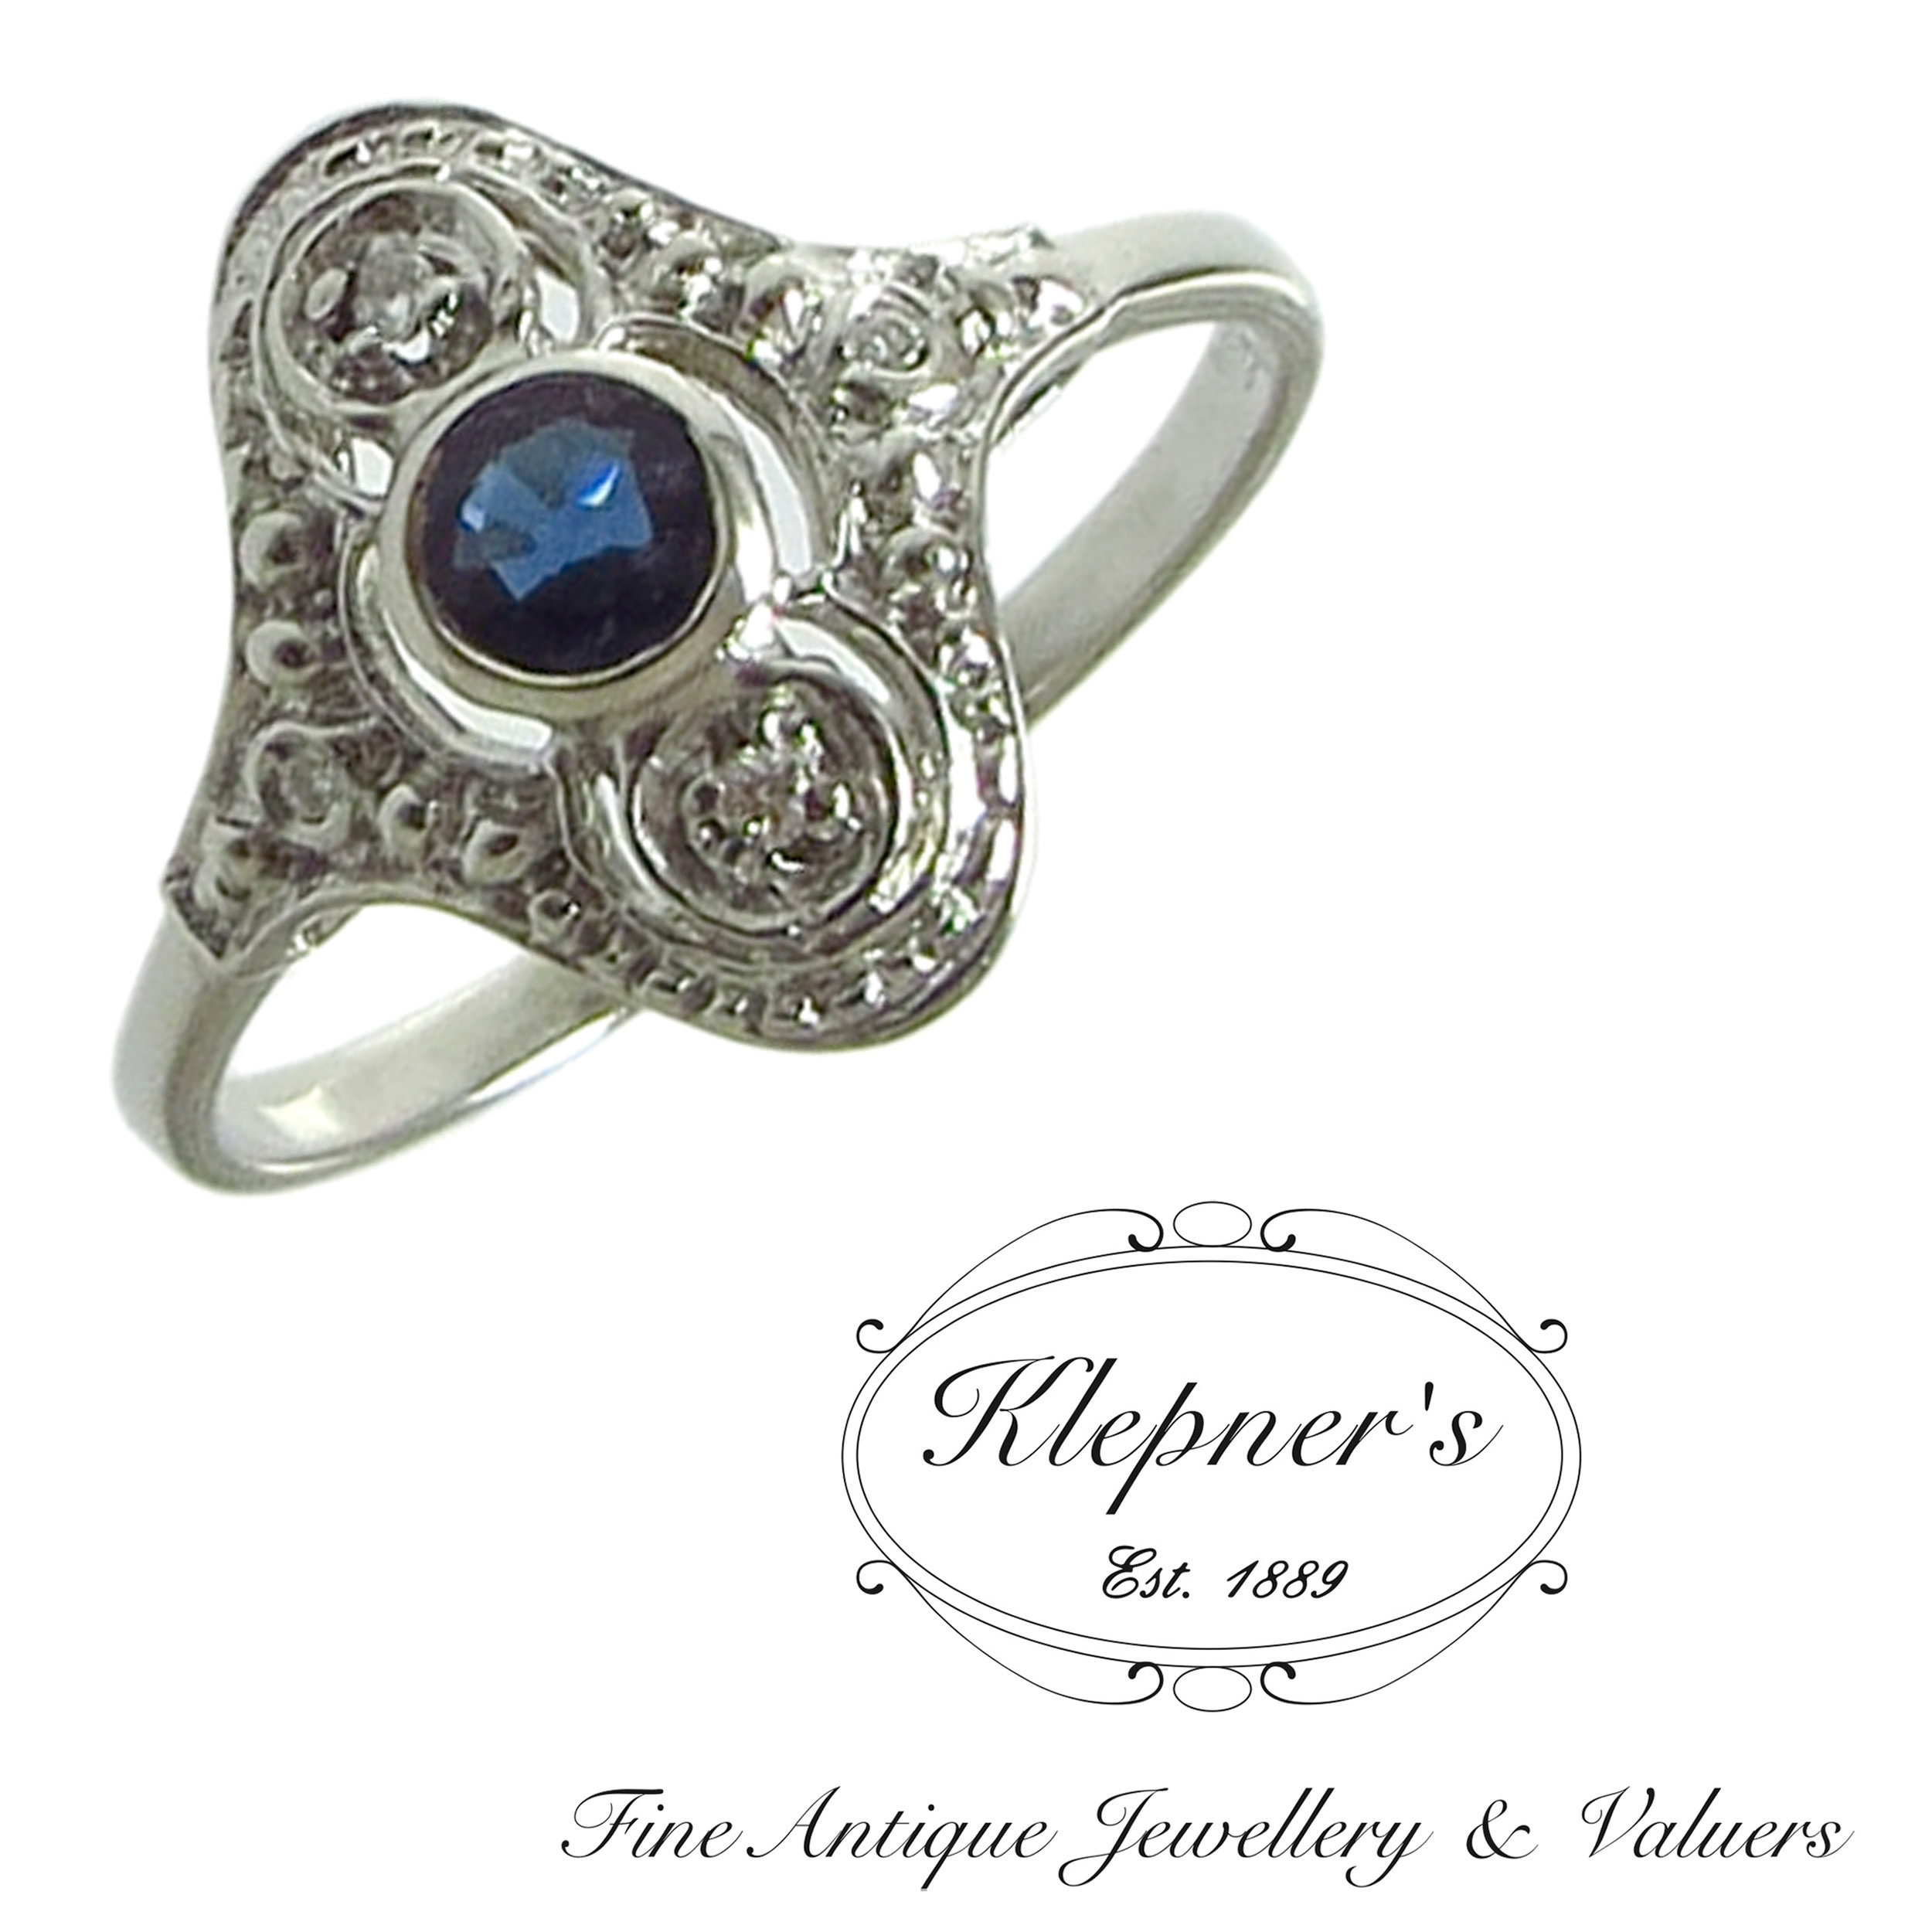 Australian sapphire & diamond Art Deco inspired engagement ring.